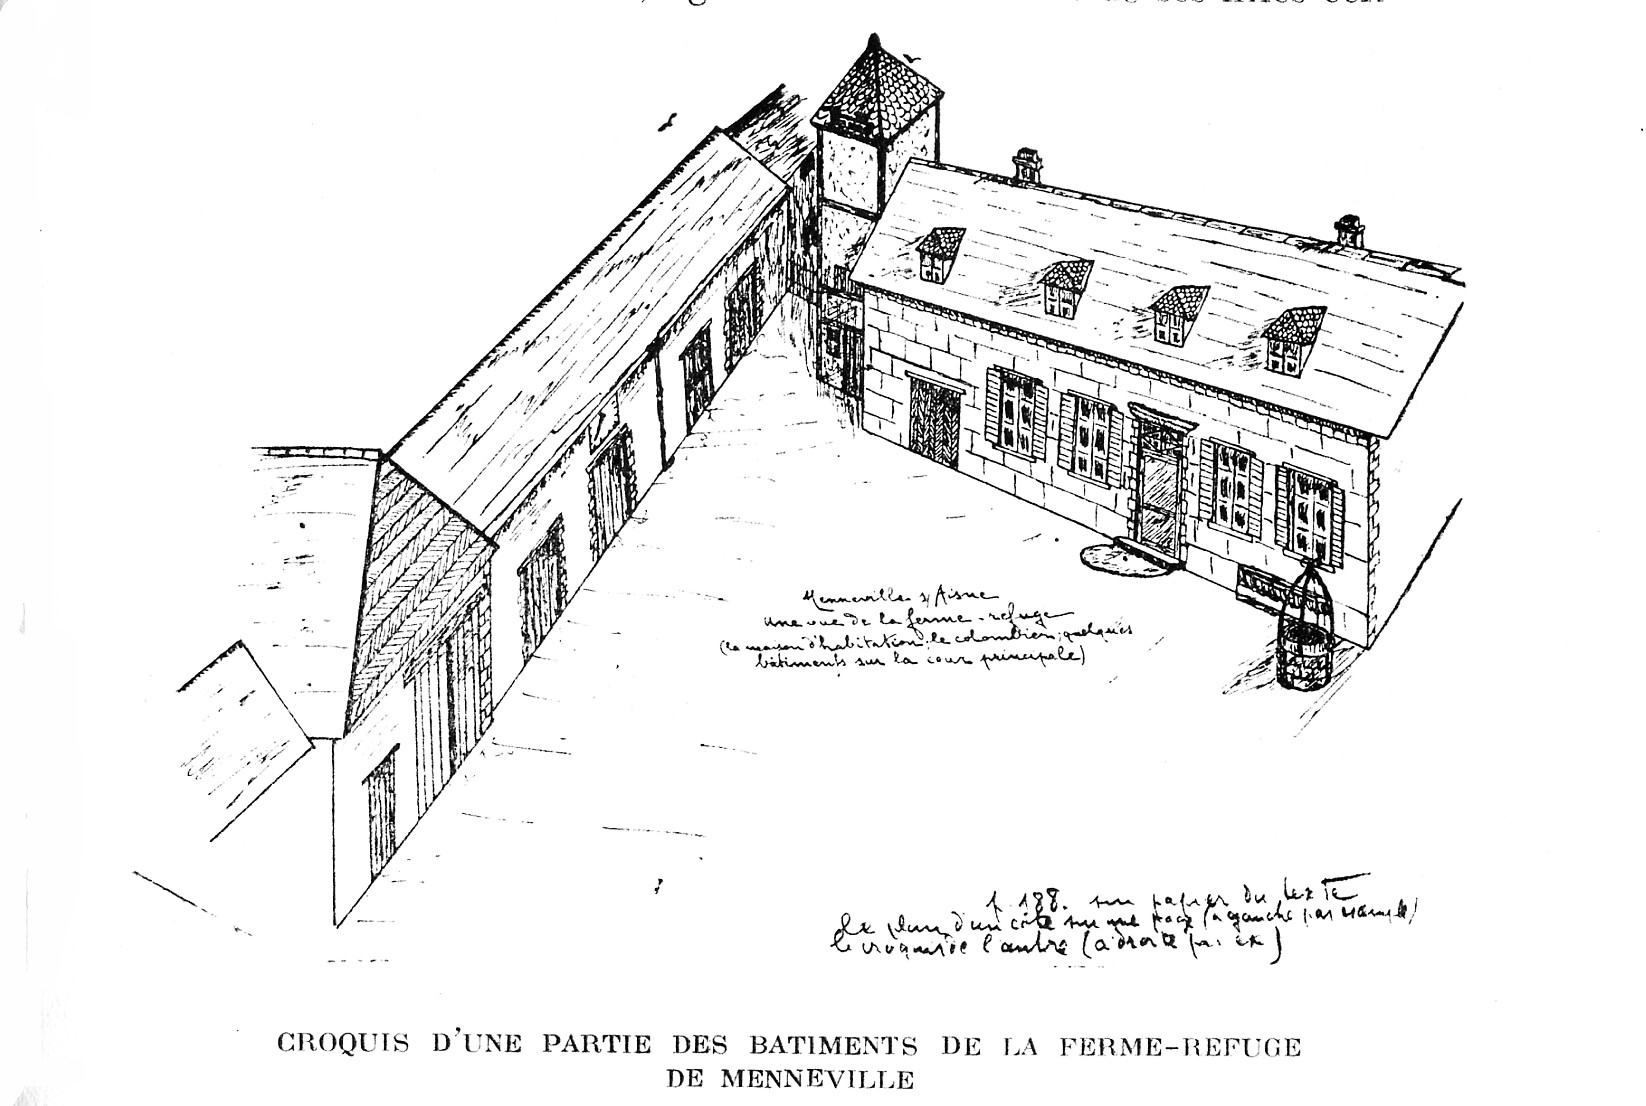 ferme-refuge-de-menneville